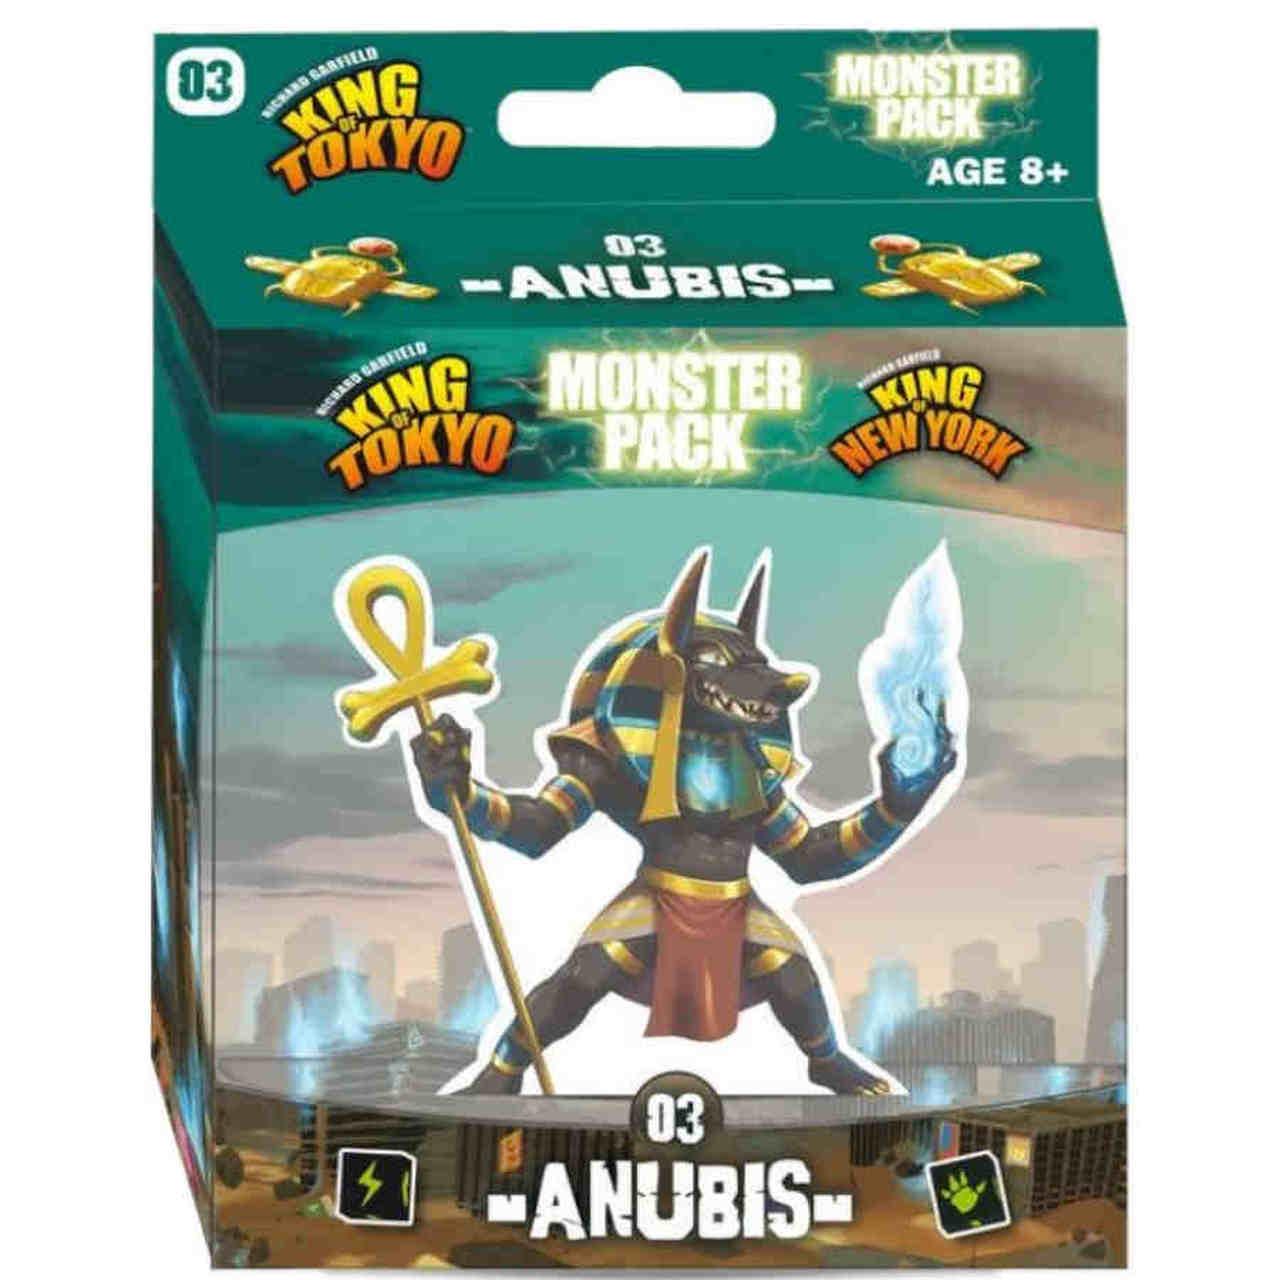 King of Tokyo - Monster Pack - 03 Anubis